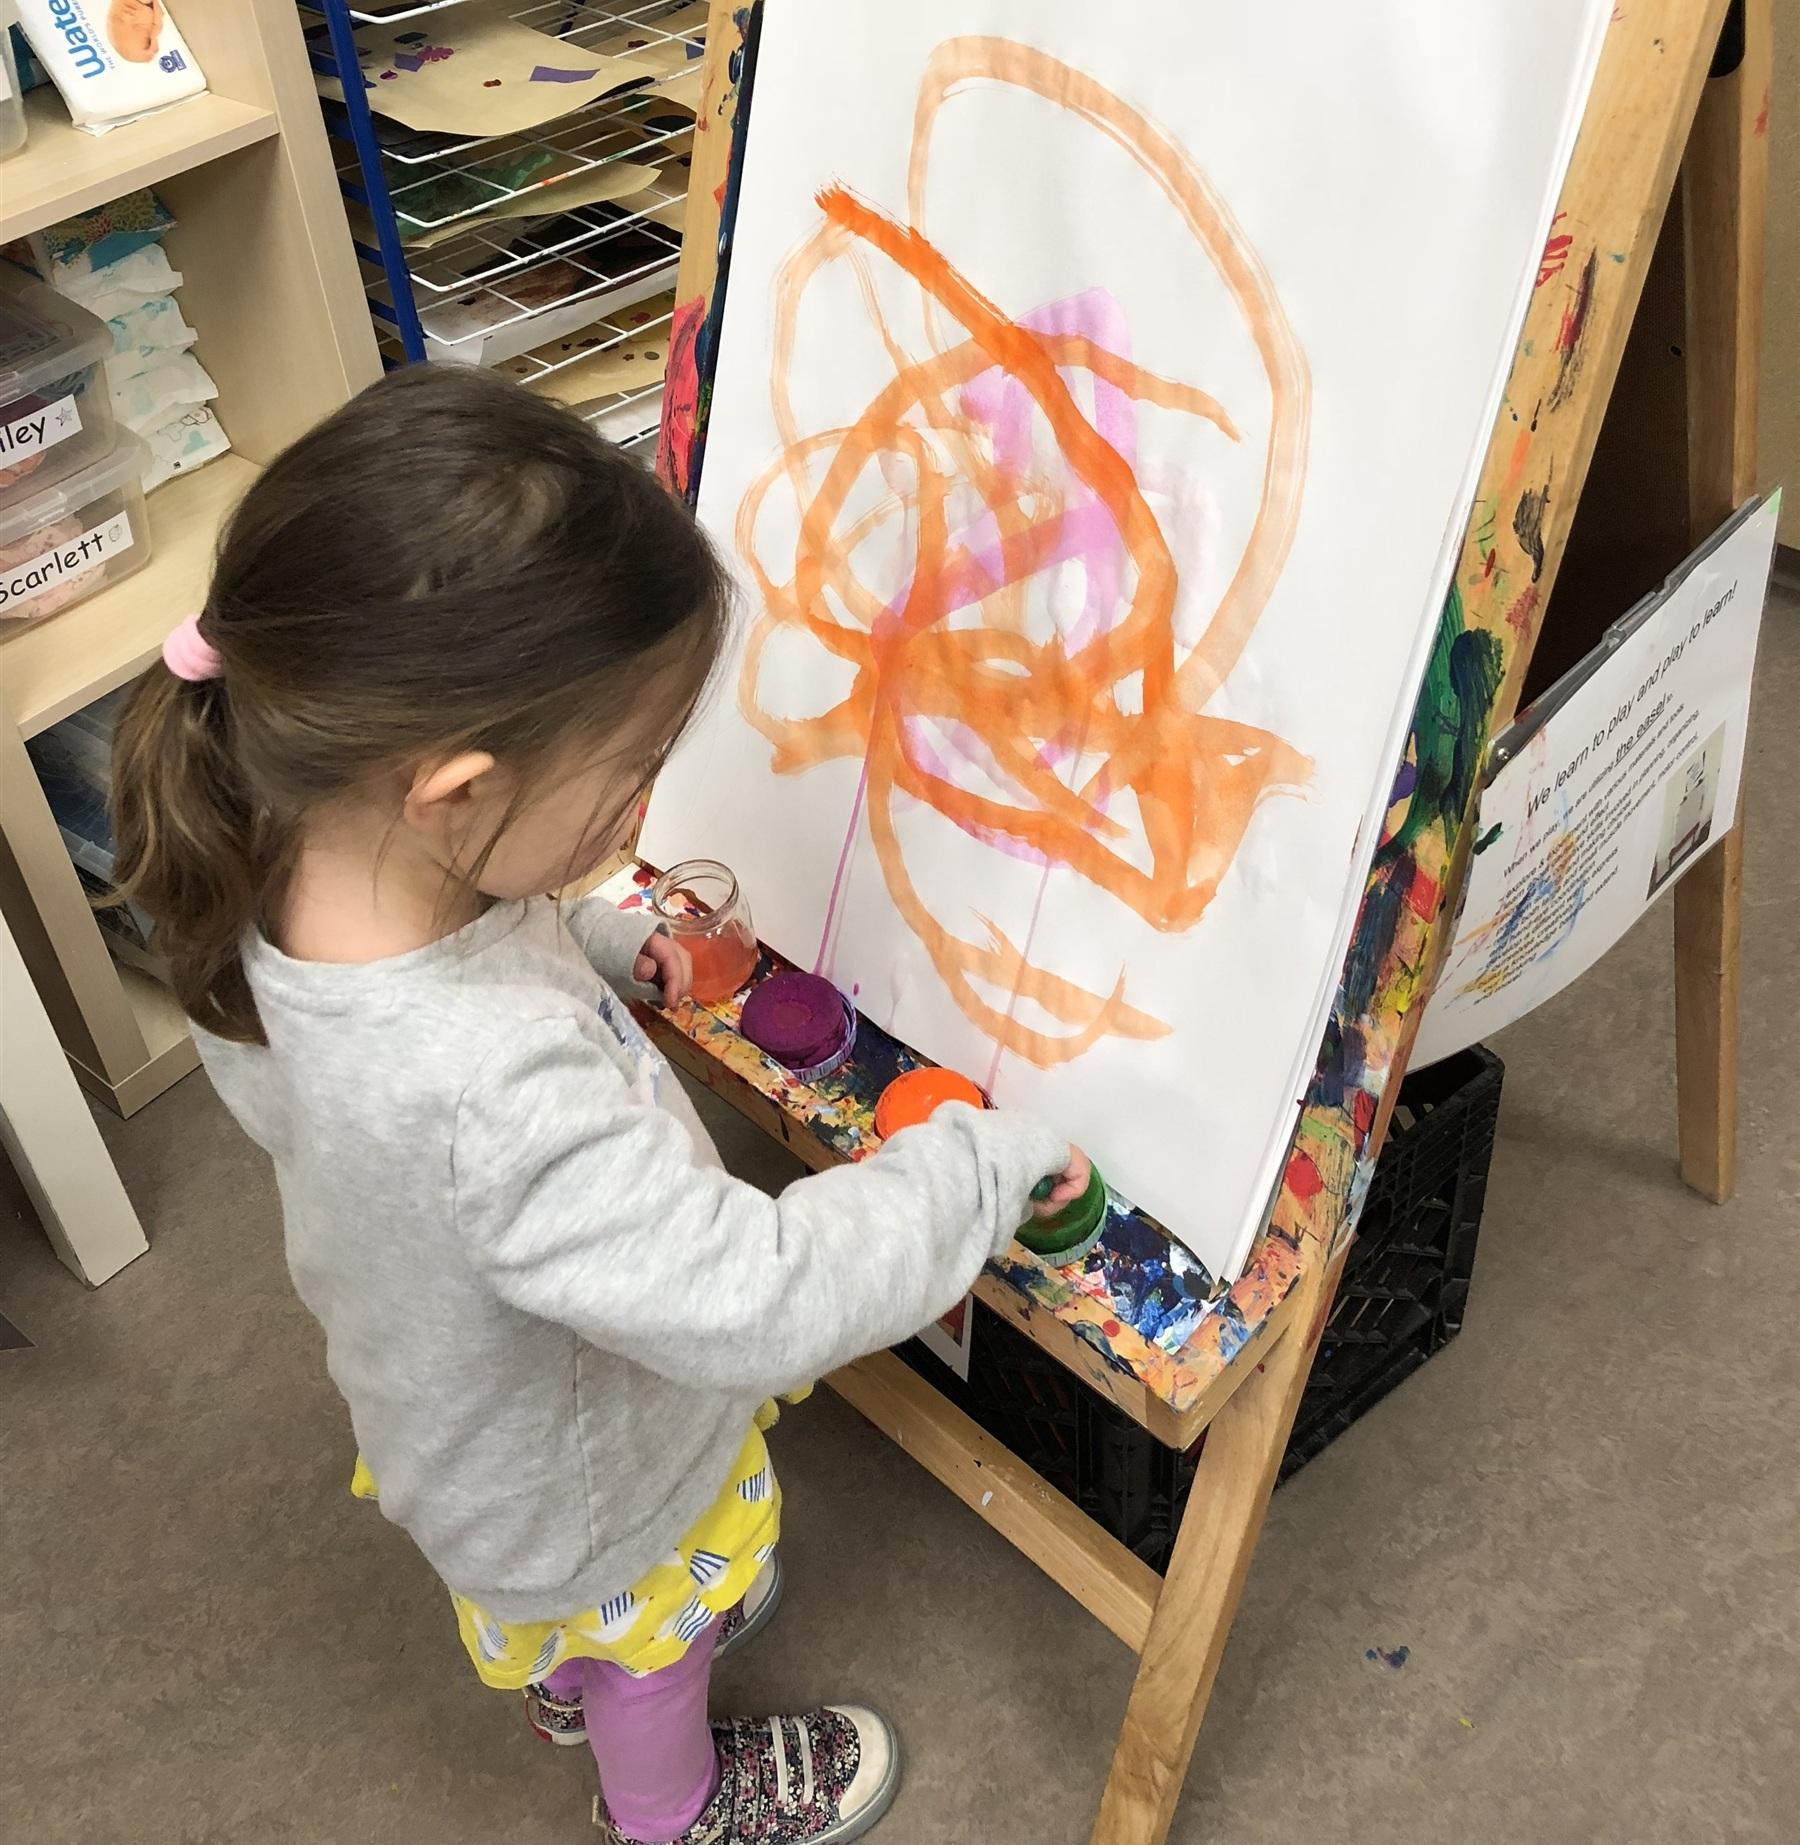 why honeycake - Jewish kids need great Jewish stories. Honeycake publishes the best of Jewish children's literature, inviting children to learn, play, and explore Jewish ideas.